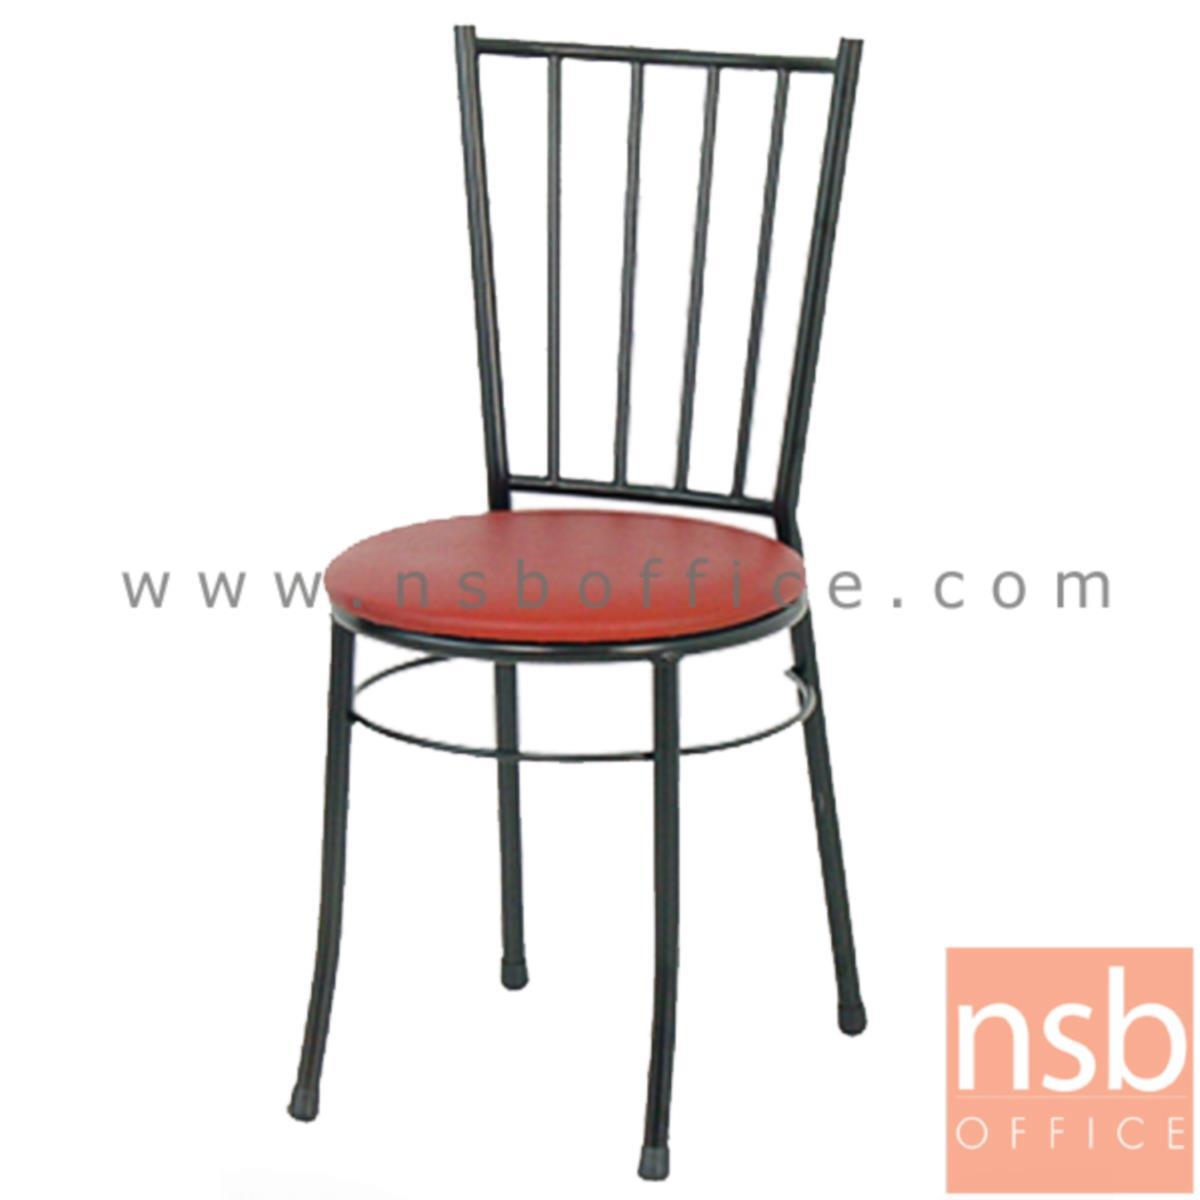 B20A041:เก้าอี้อเนกประสงค์เหล็ก รุ่น WILLY-BB  ขาเหล็กพ่นดำ